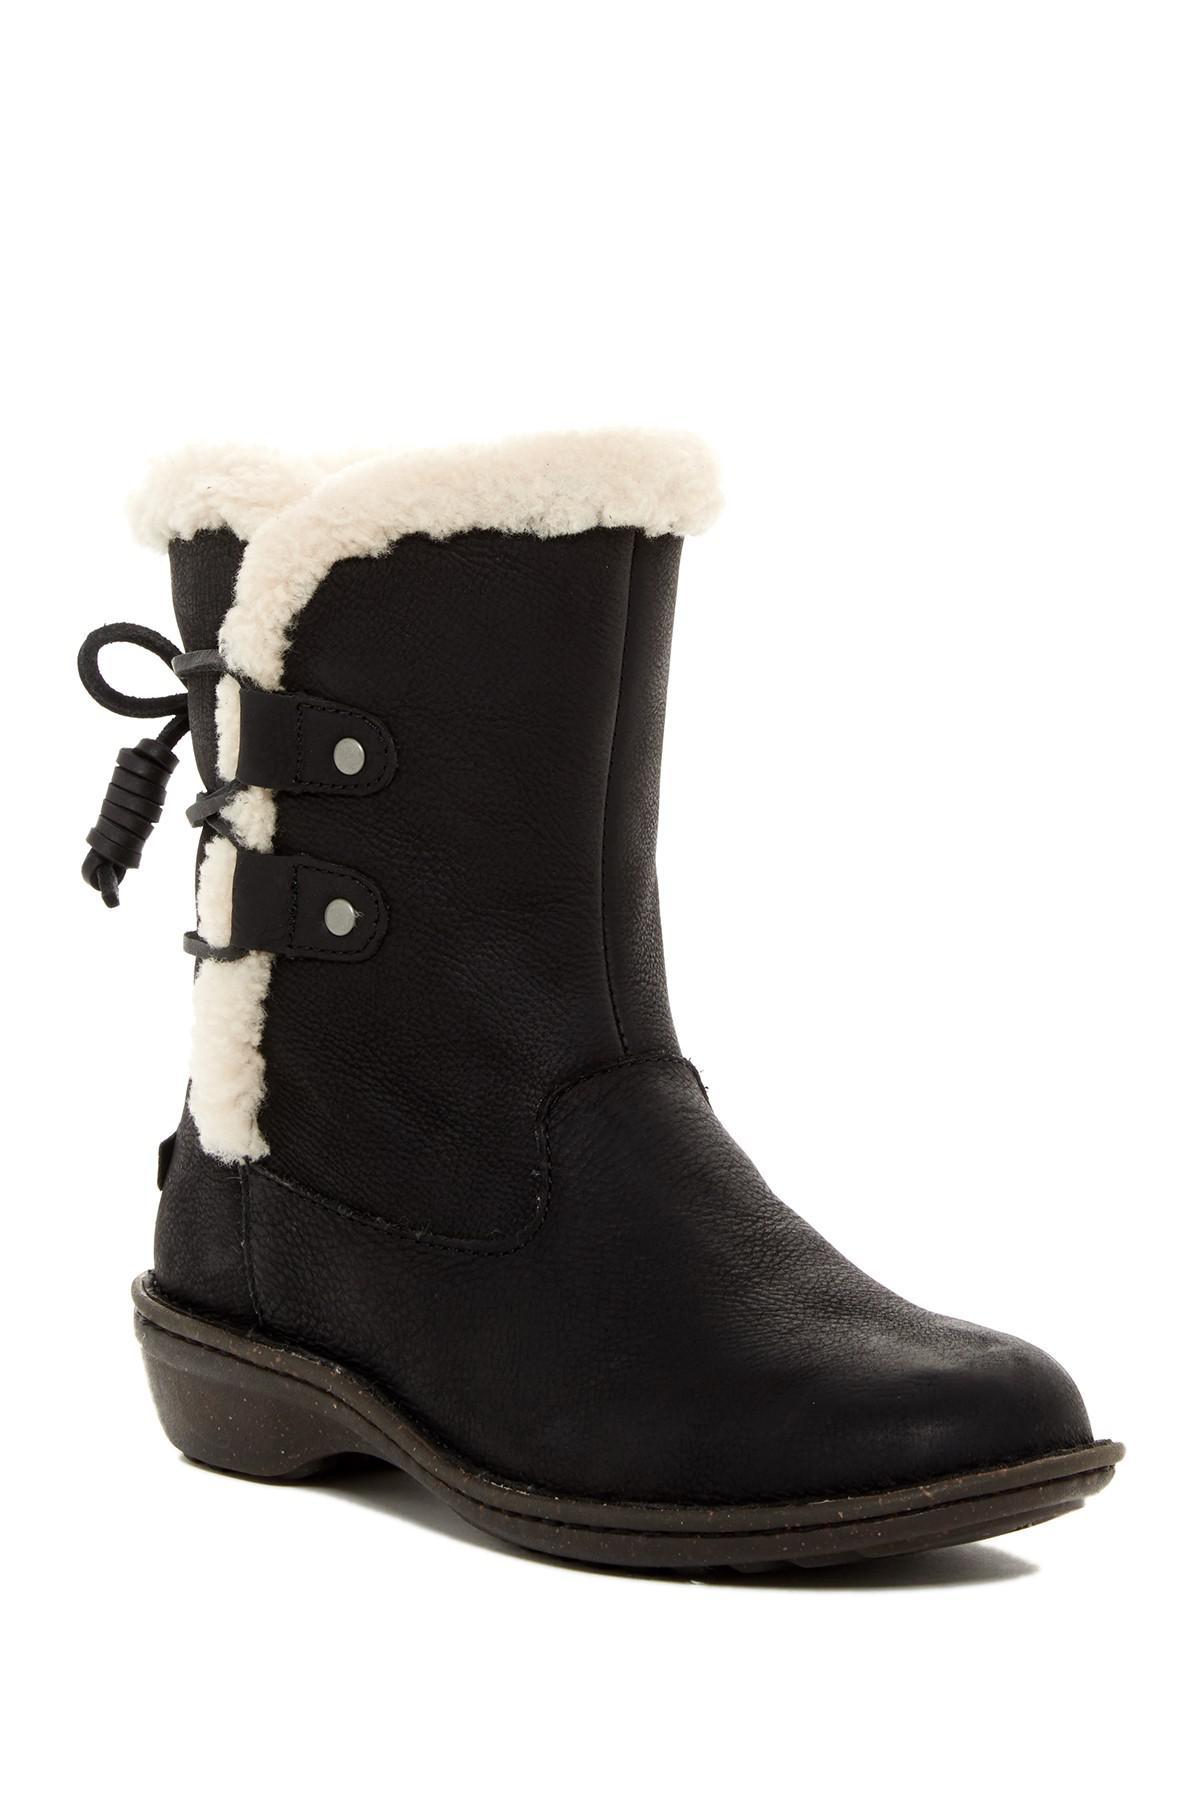 21525b0bc6f Ugg Black Akadia Genuine Sheepskin Lace-up Boot